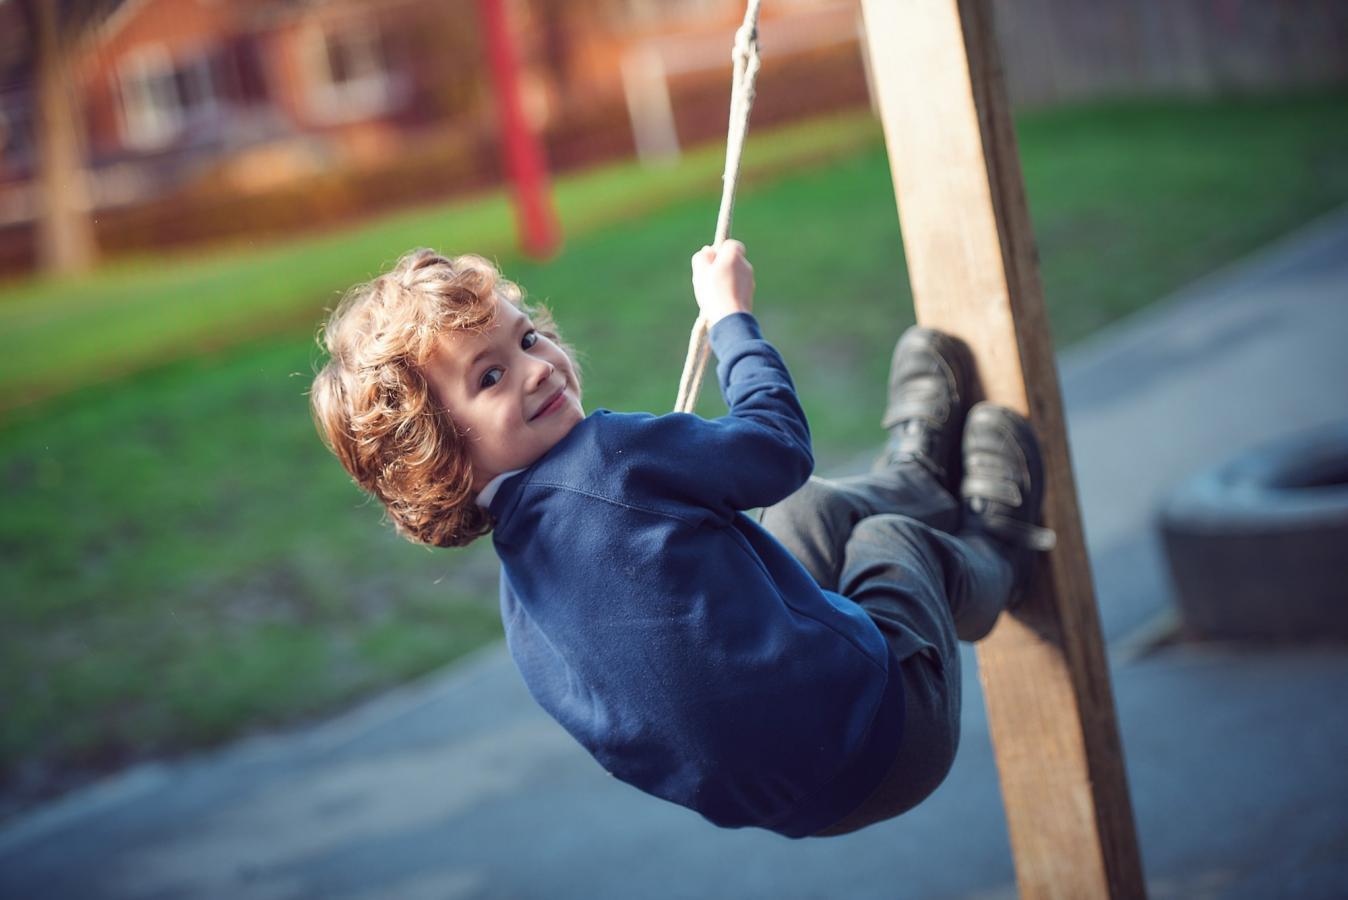 Towngate pupil climbing